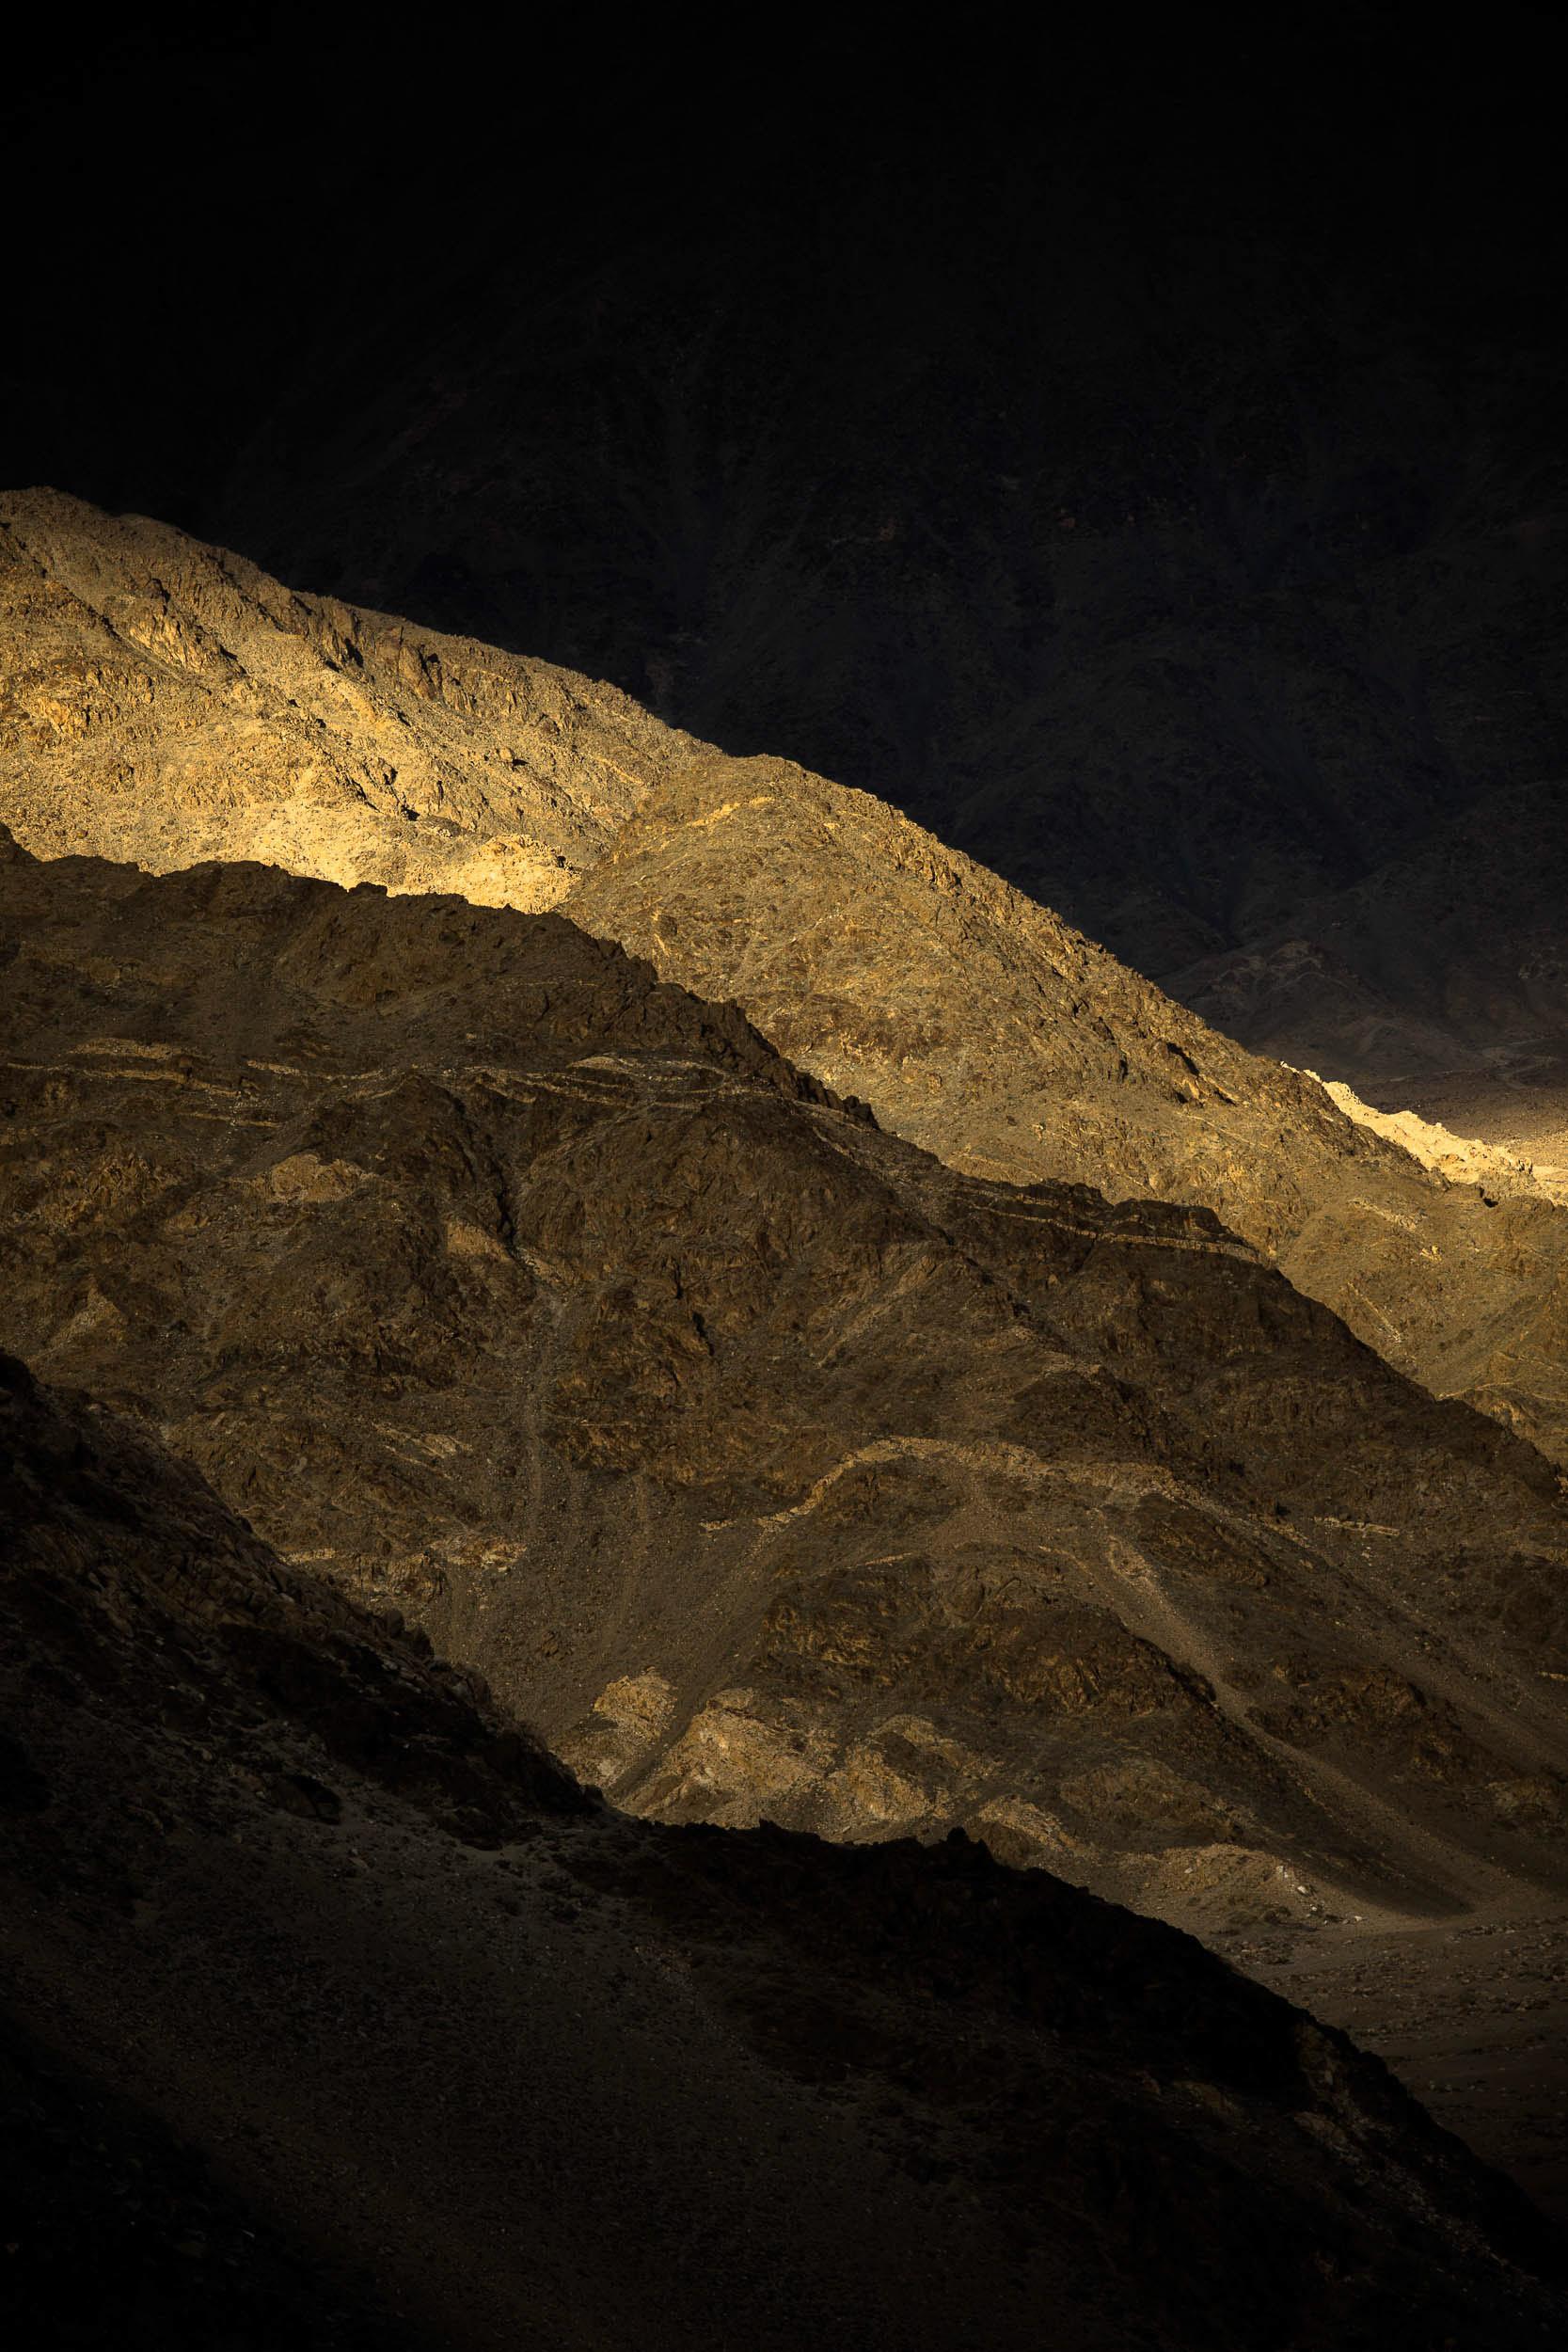 Sindhur_Photography_Travel_Landscape_Ladakh-18.JPG